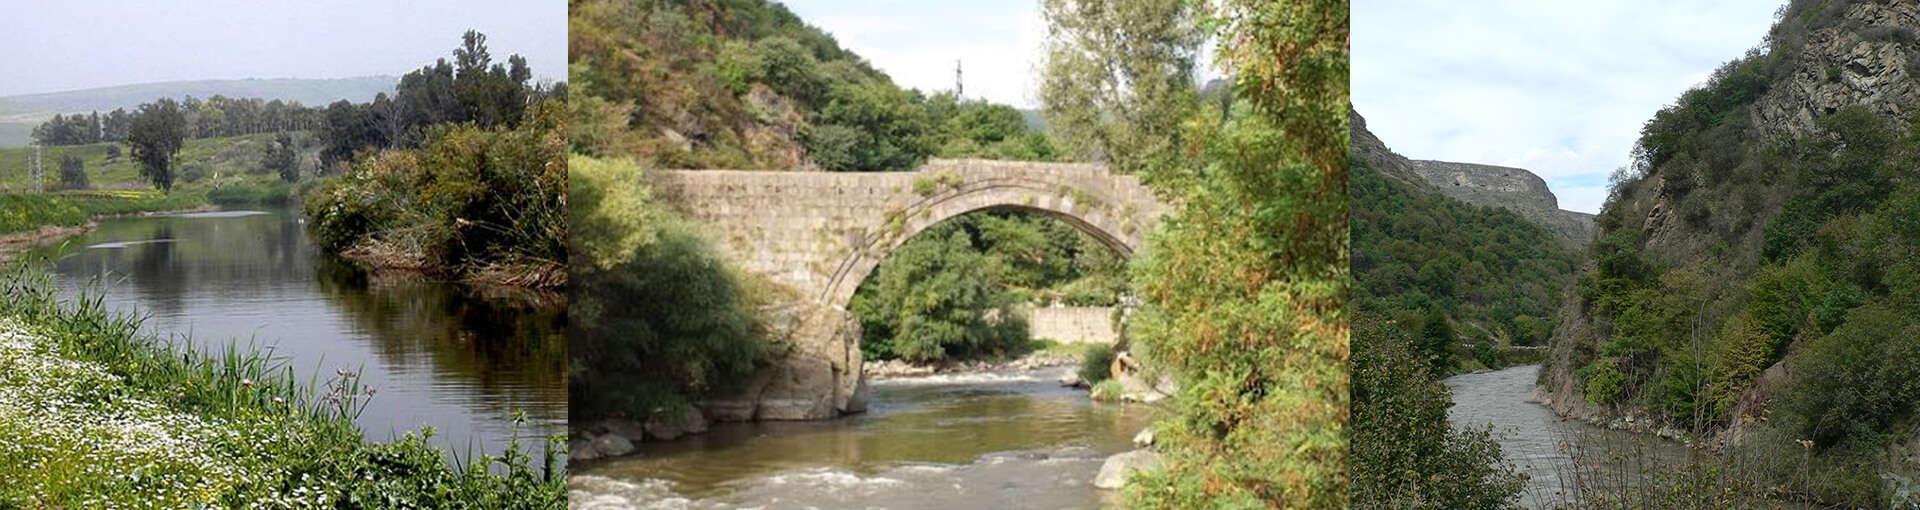 Rivers in Armenia